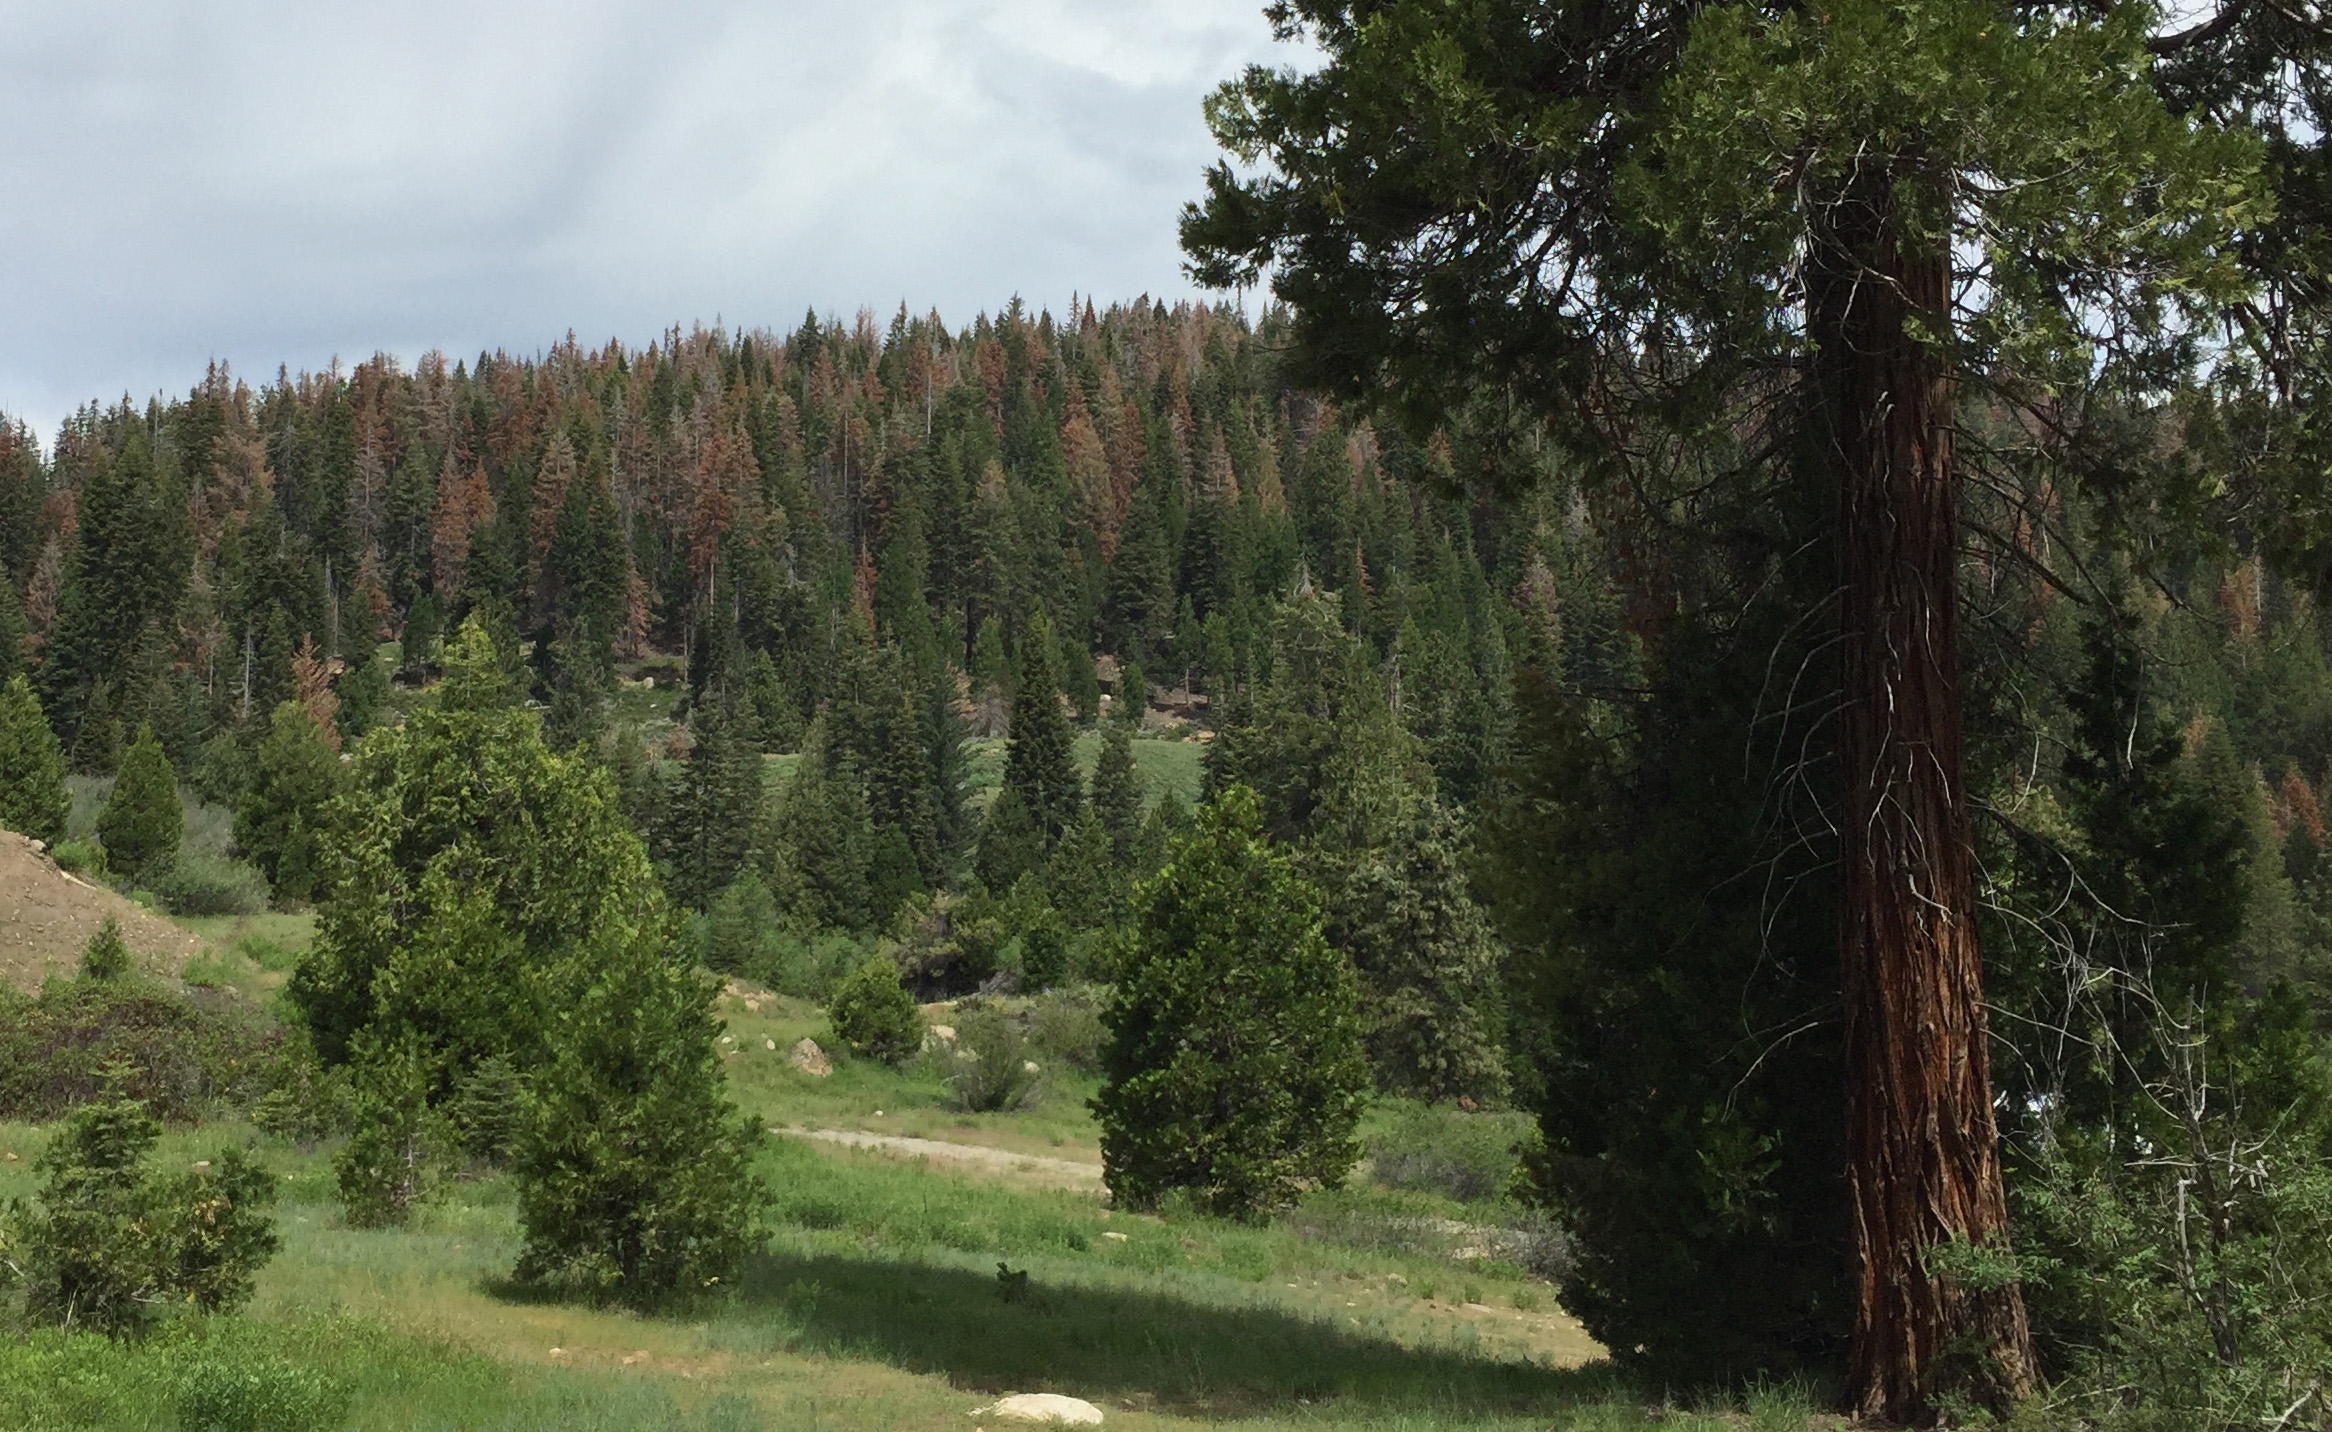 Pine Tree Deaths Plague California's Sierra Nevada | HuffPost